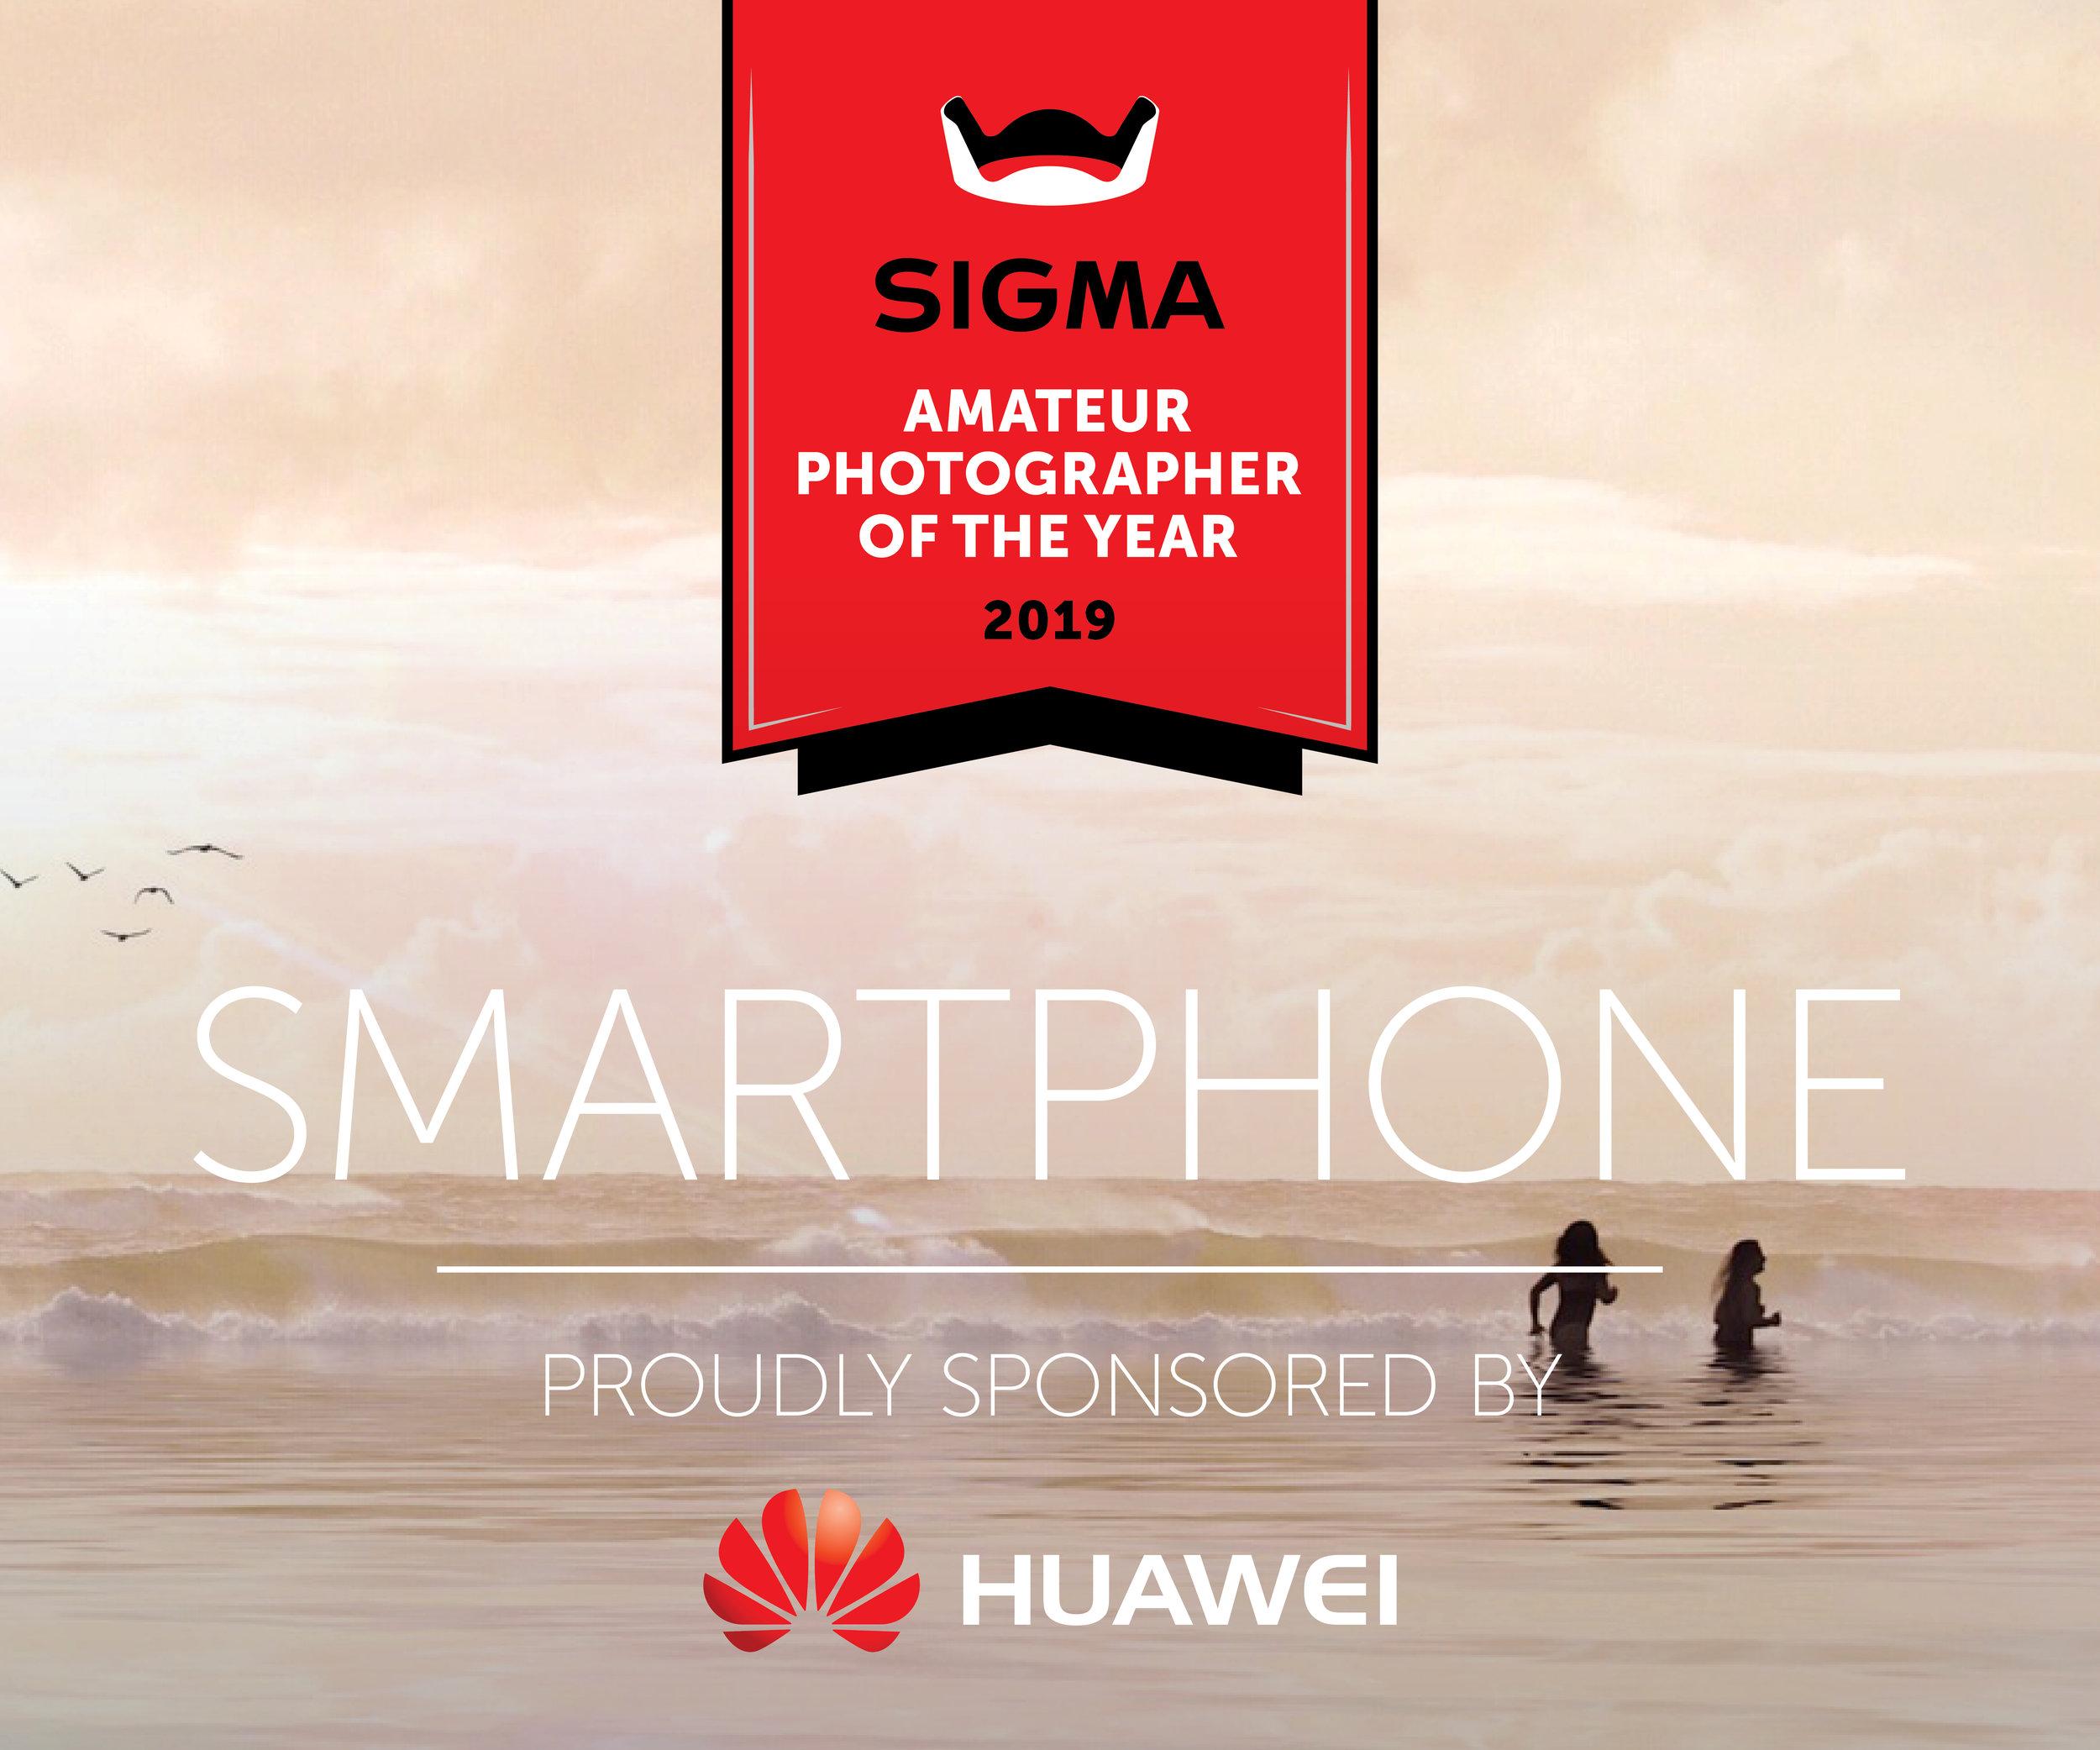 Smartphone 600x500px.jpg